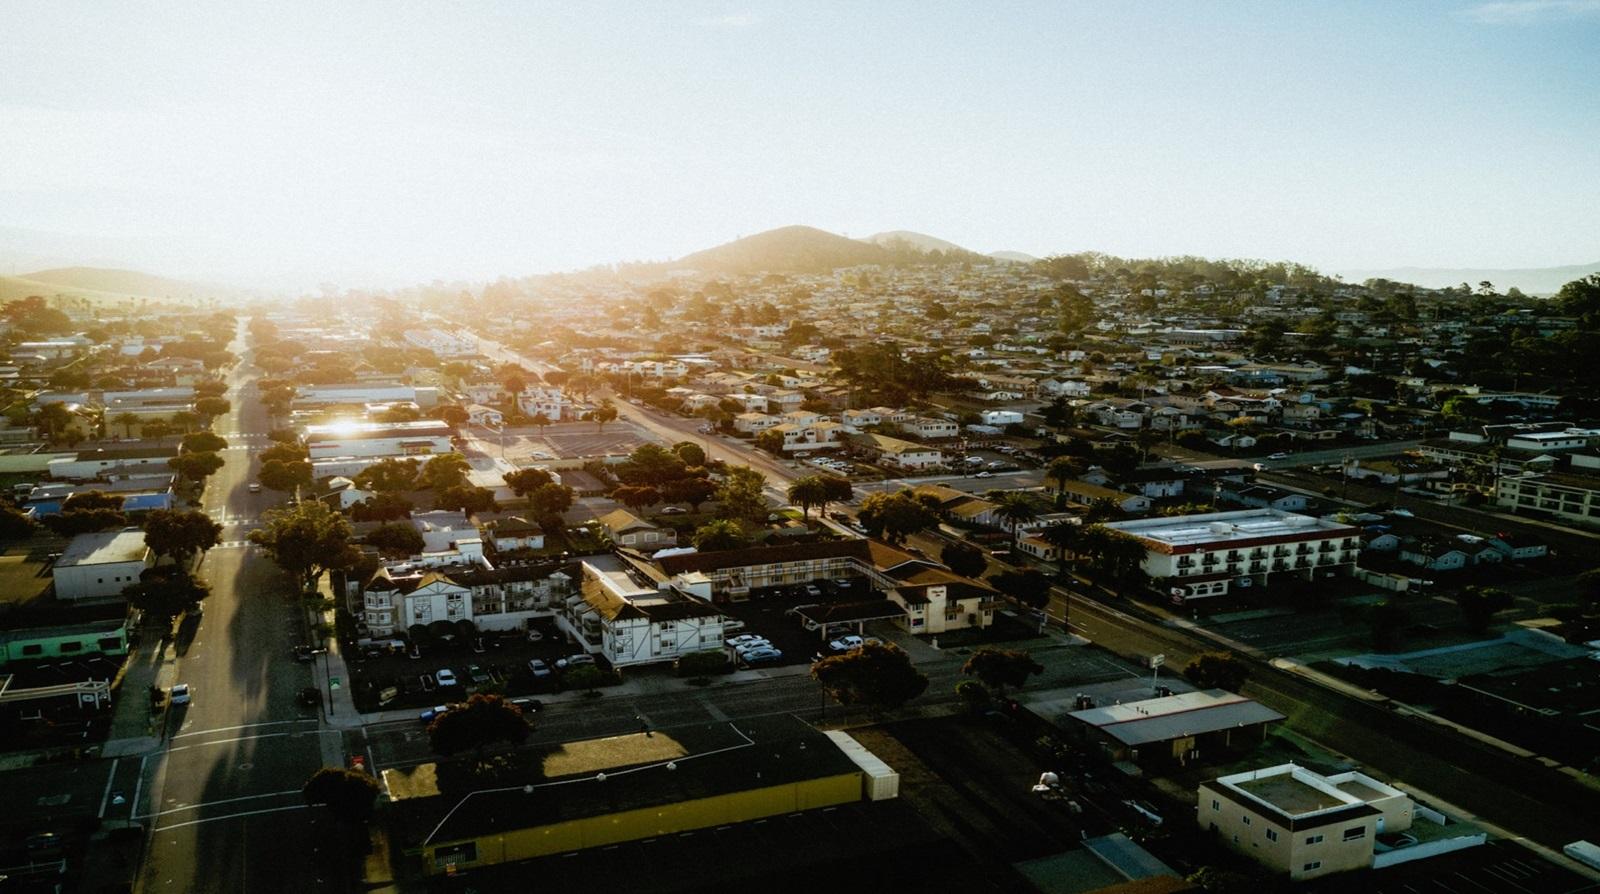 Sunrise over city grid